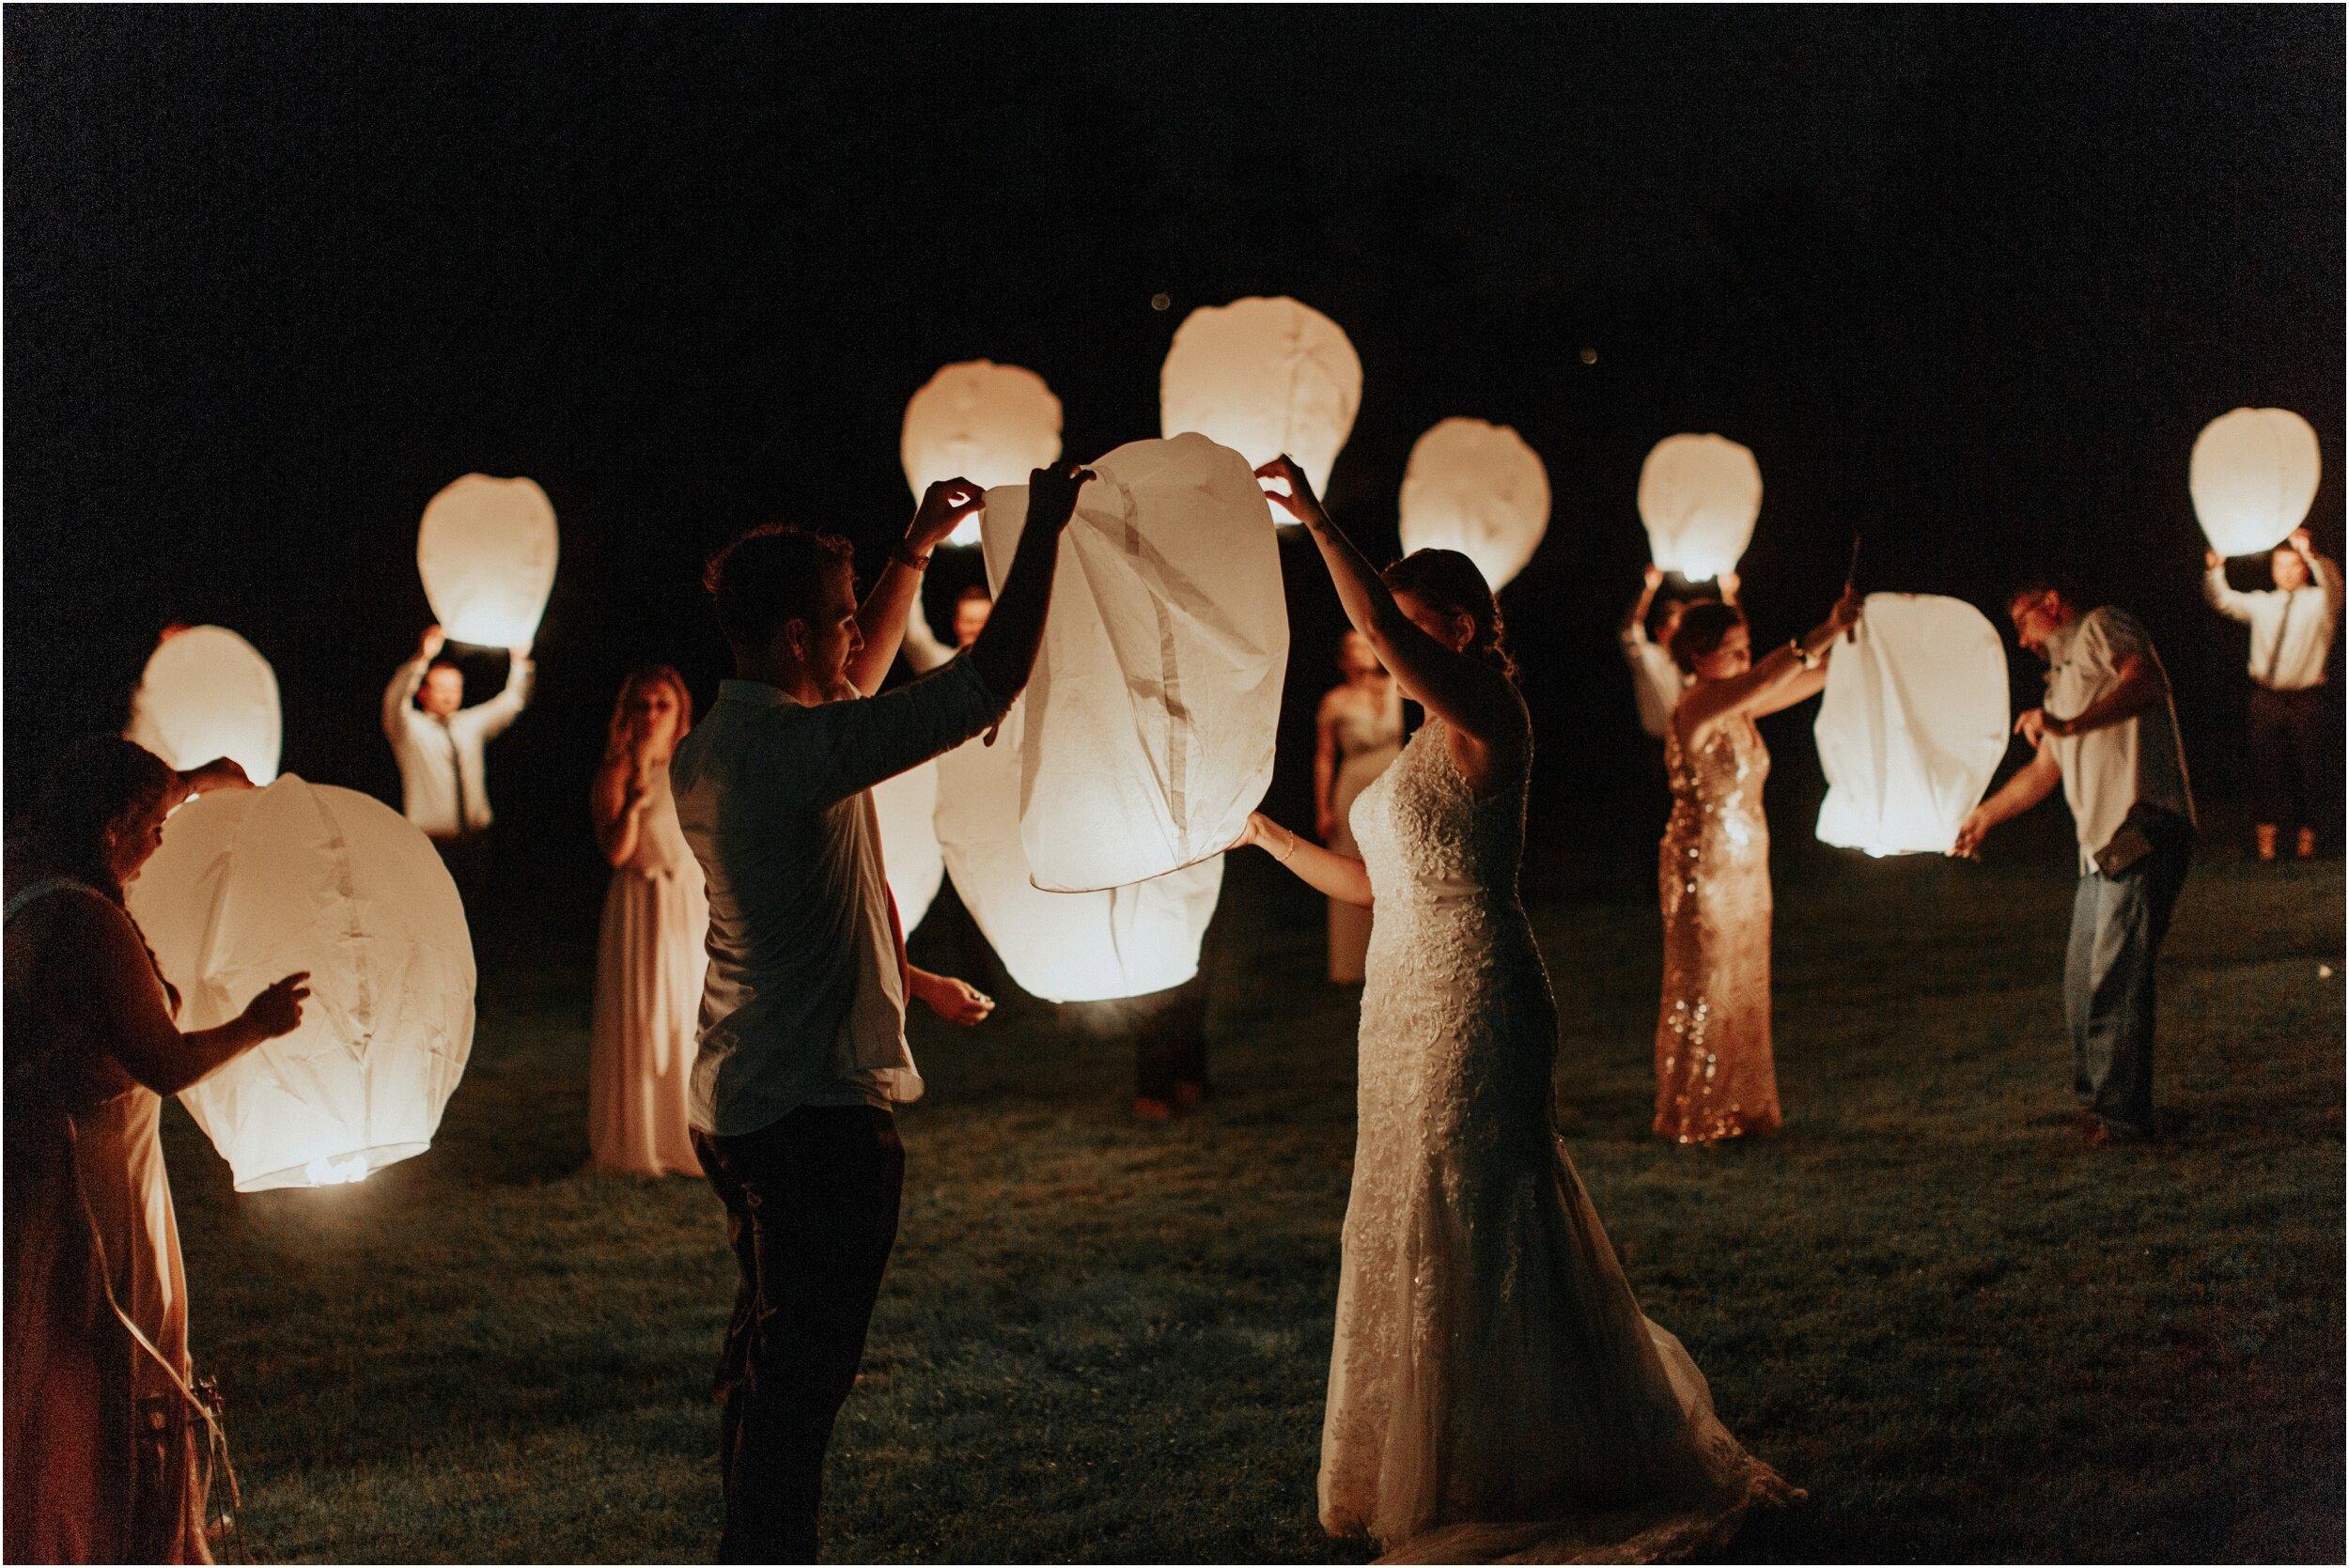 steph-and-jordan-cox-our-wedding-historic-shady-lane-compass-wedding-collective-hazel-lining-photography-destination-elopement-wedding-engagement-photography_0106.jpg